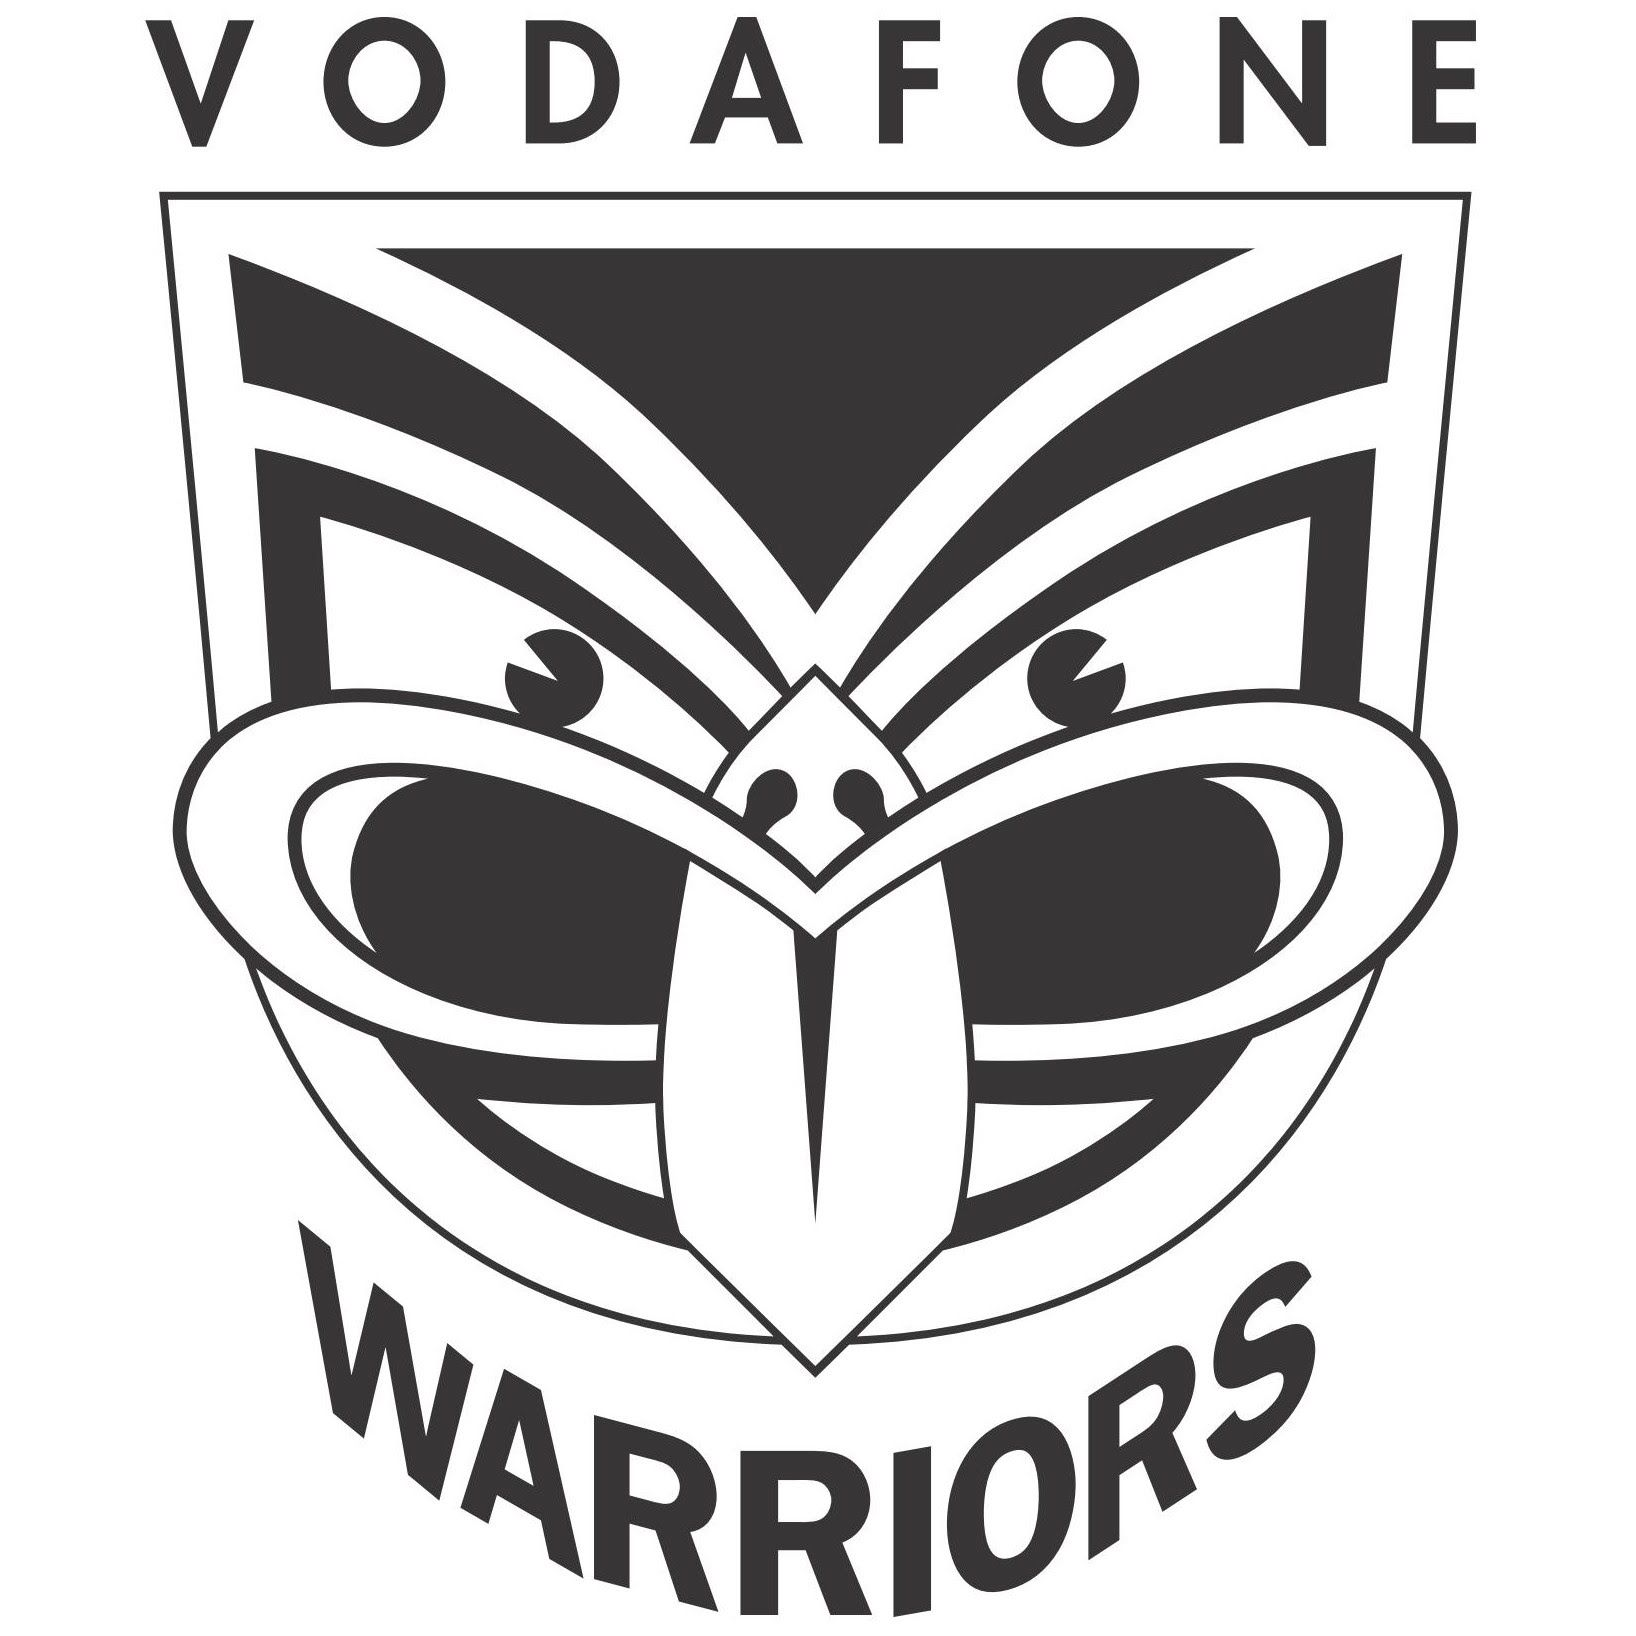 1995/1996 Auckland Warriors AustralianRugbyLeague. 1997